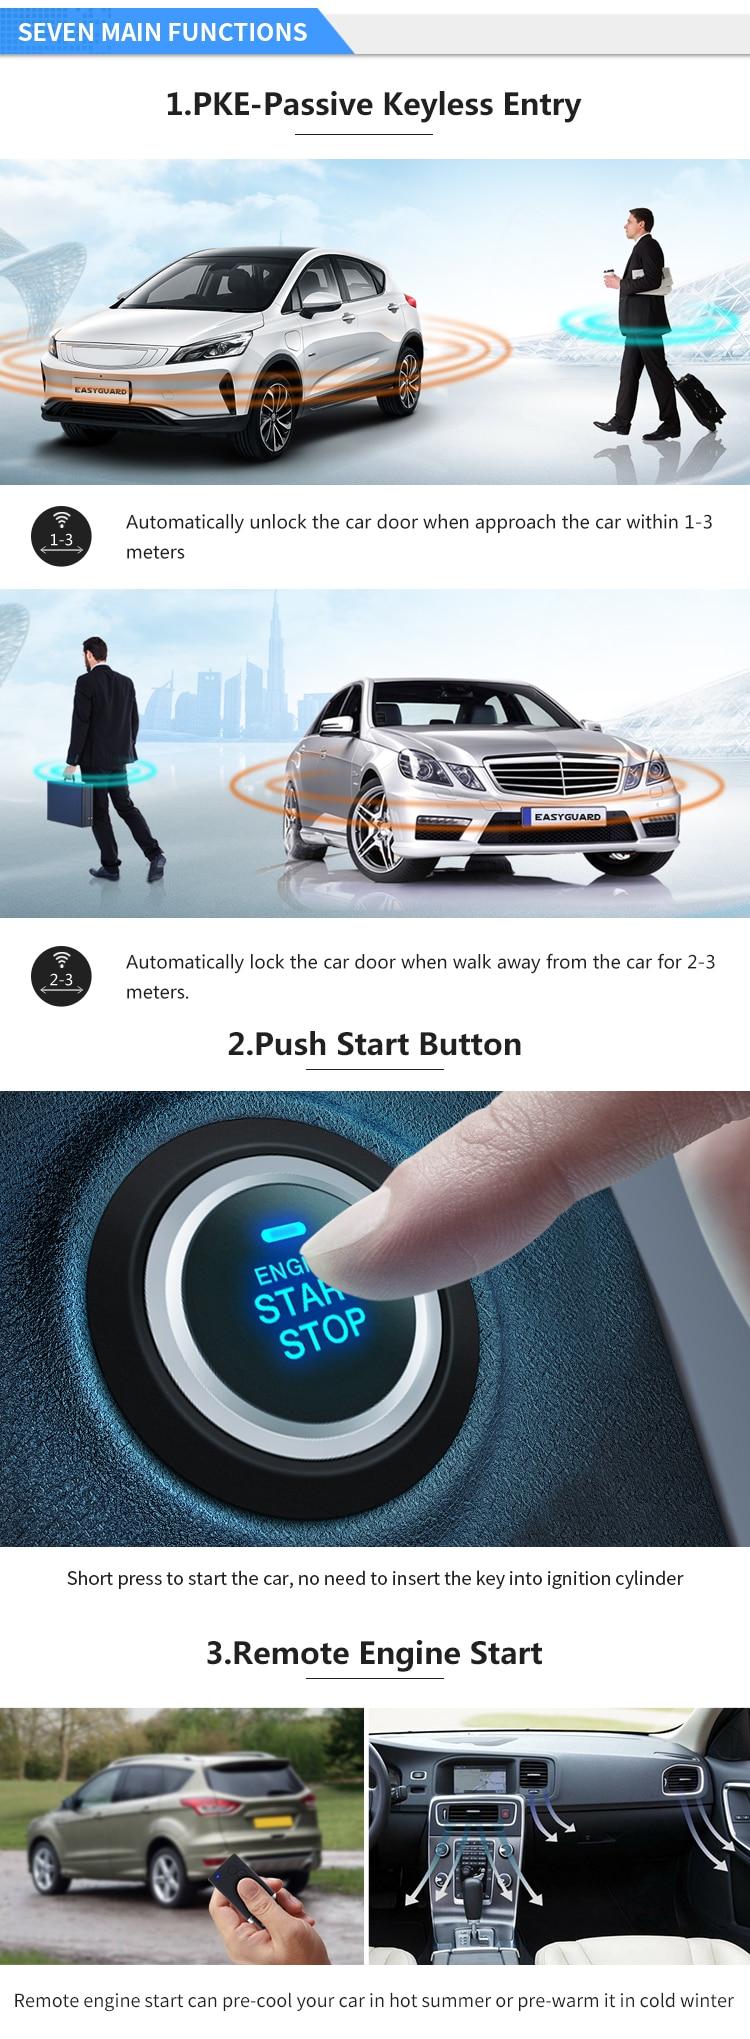 Easyguard Smart Key Pke Car Alarm System Remote Start Keyless Go Password Entry 600682323765